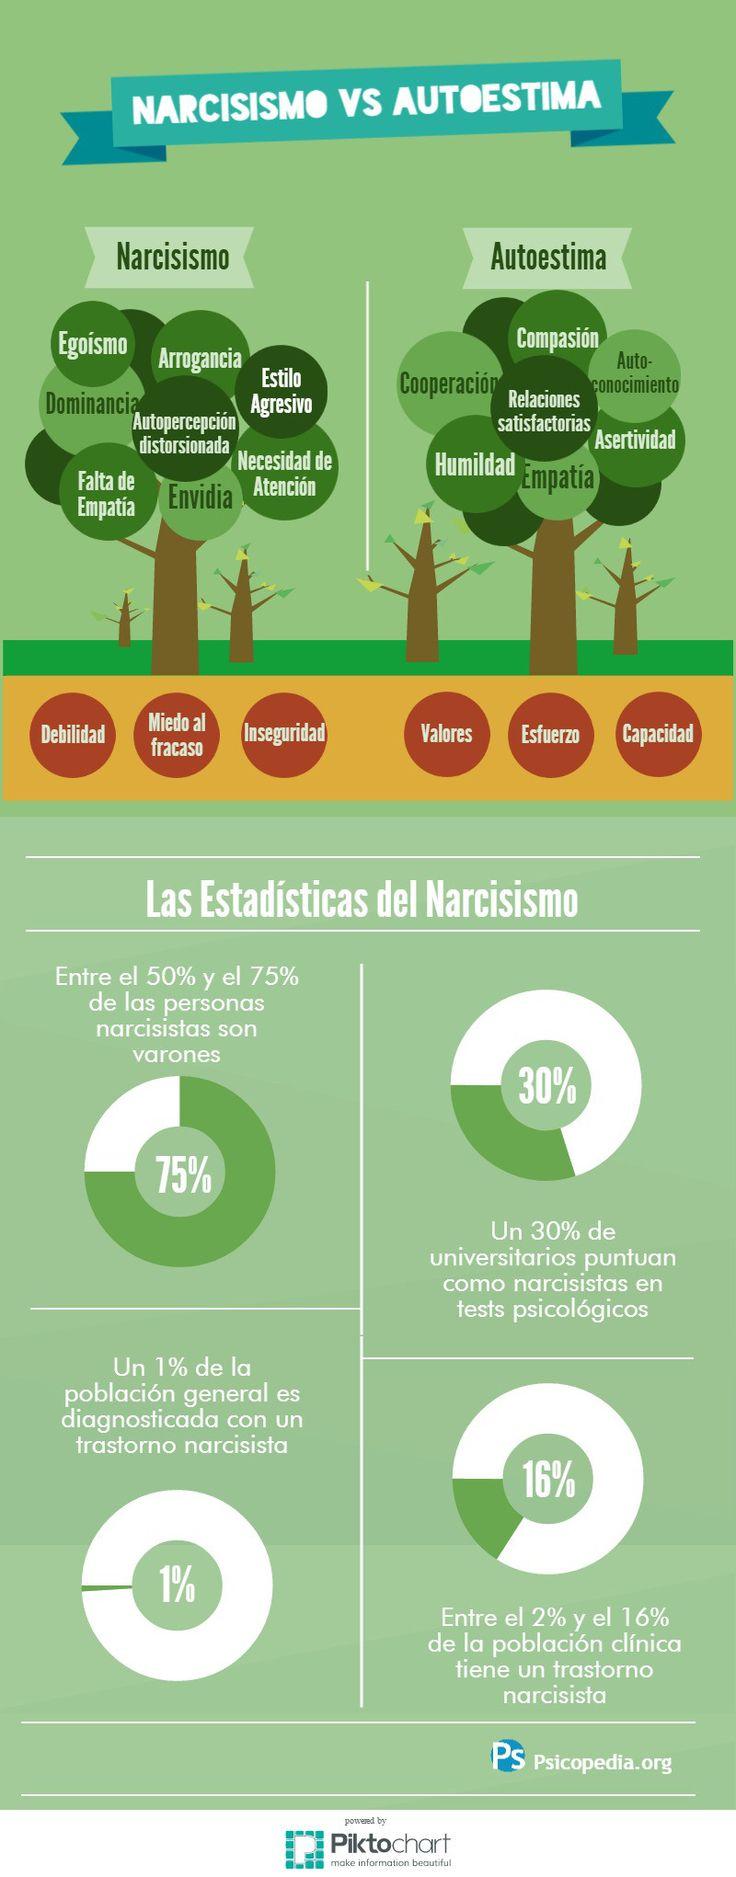 Narcisismo vs Autoestima #infografia #infographic #psychology